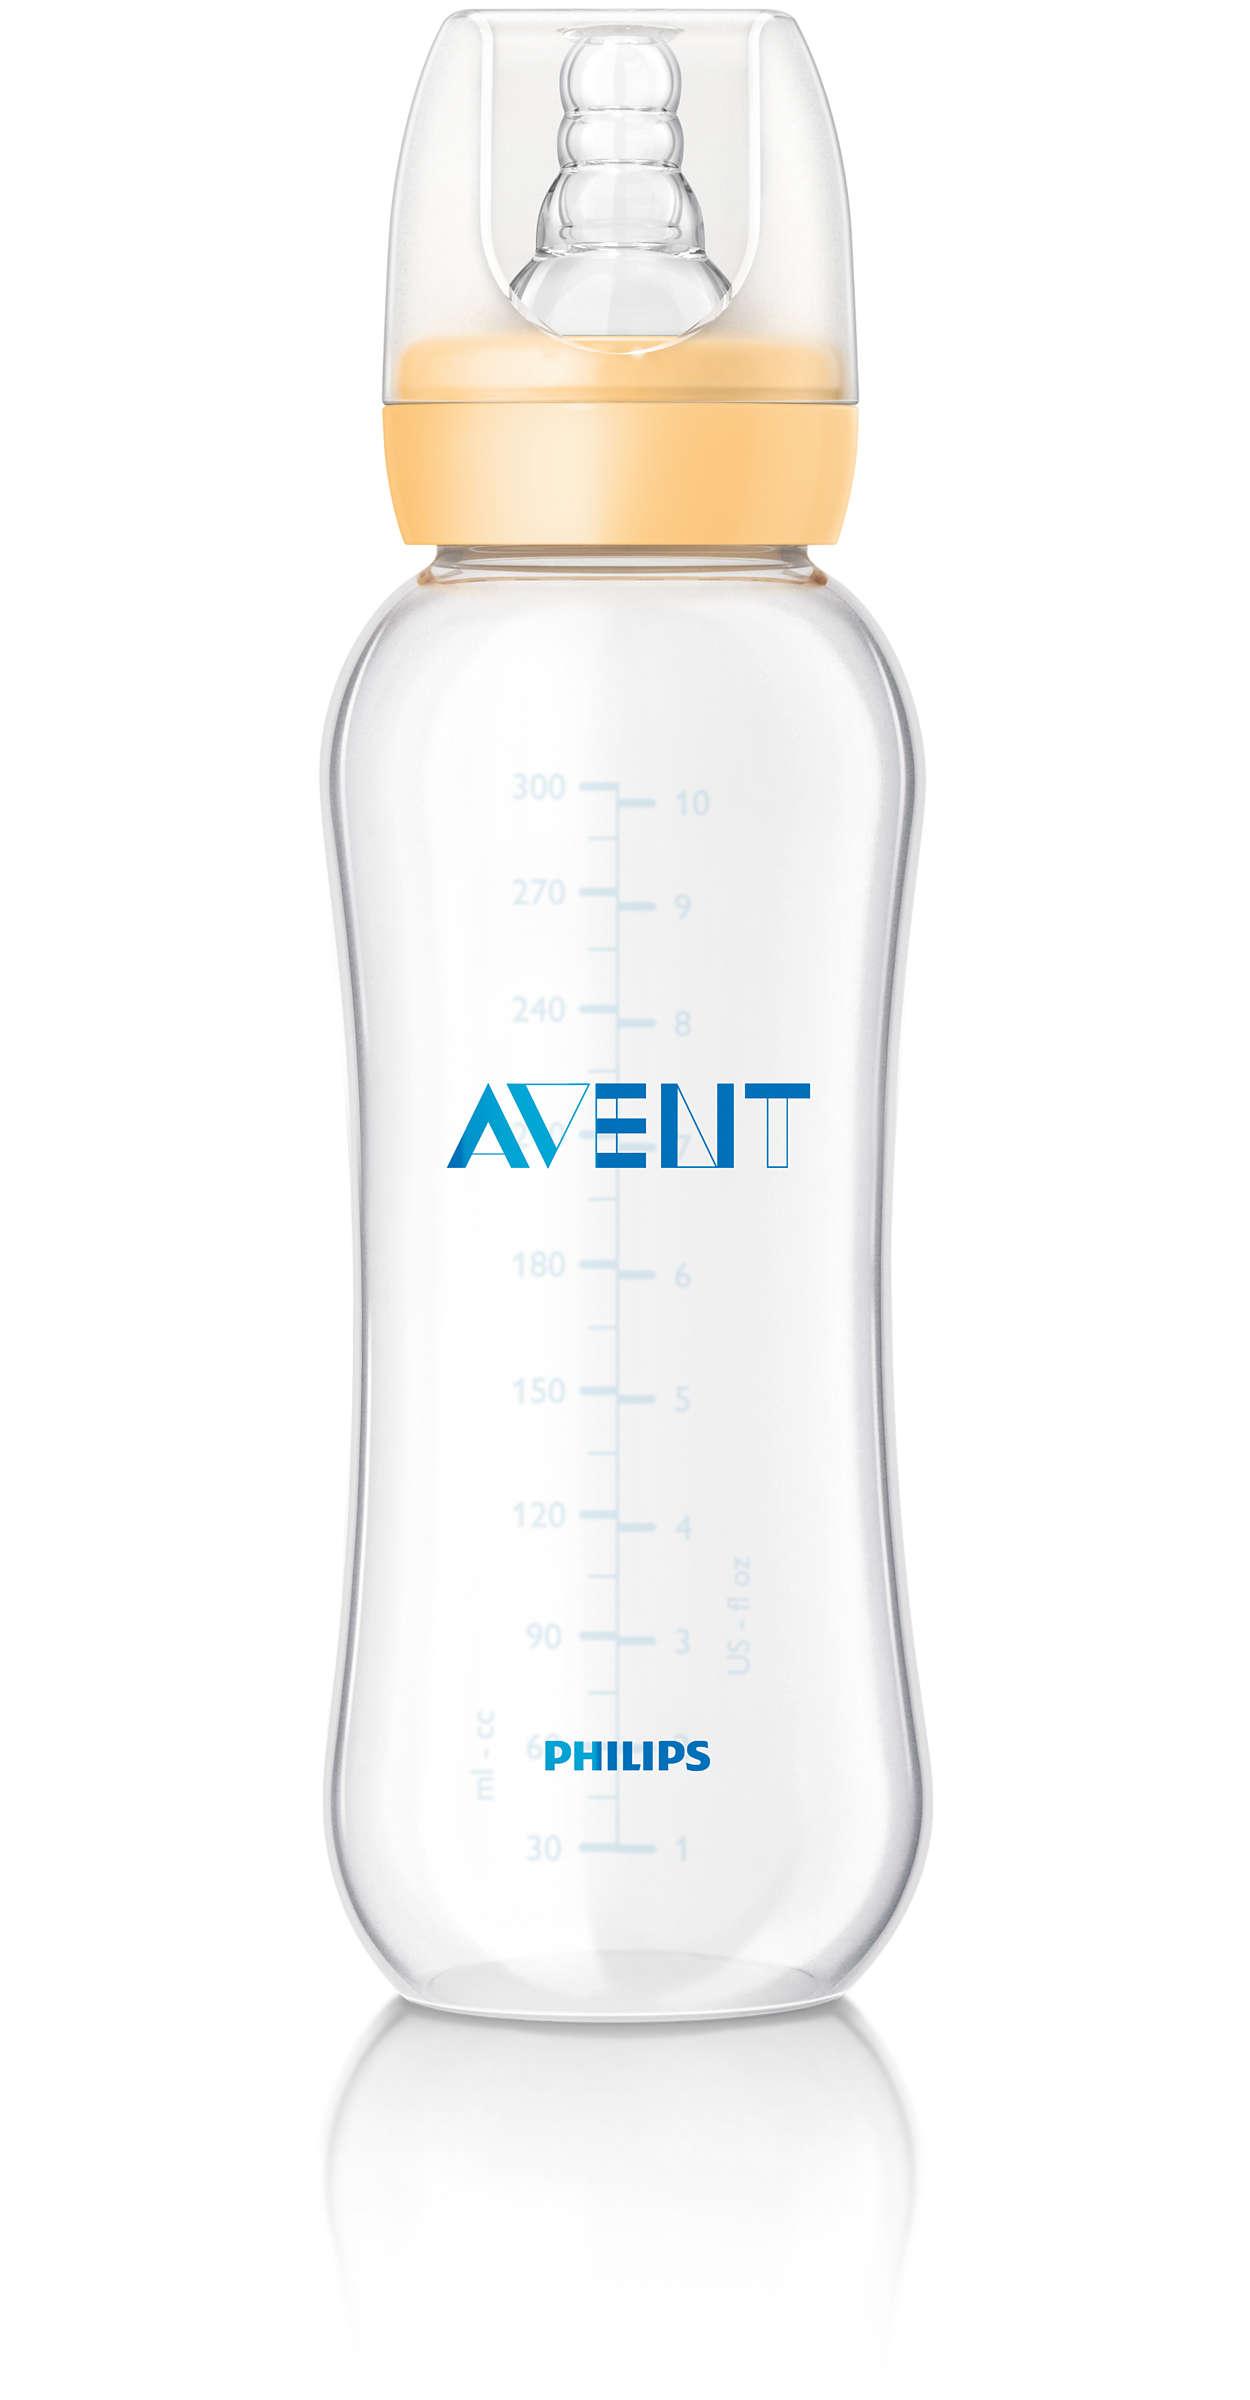 Бутылочка из полипропилена - Сери Essential, 300 мл,Товары дл кормлени<br>Бутылочка из полипропилена - Сери Essential, 300 мл,<br>